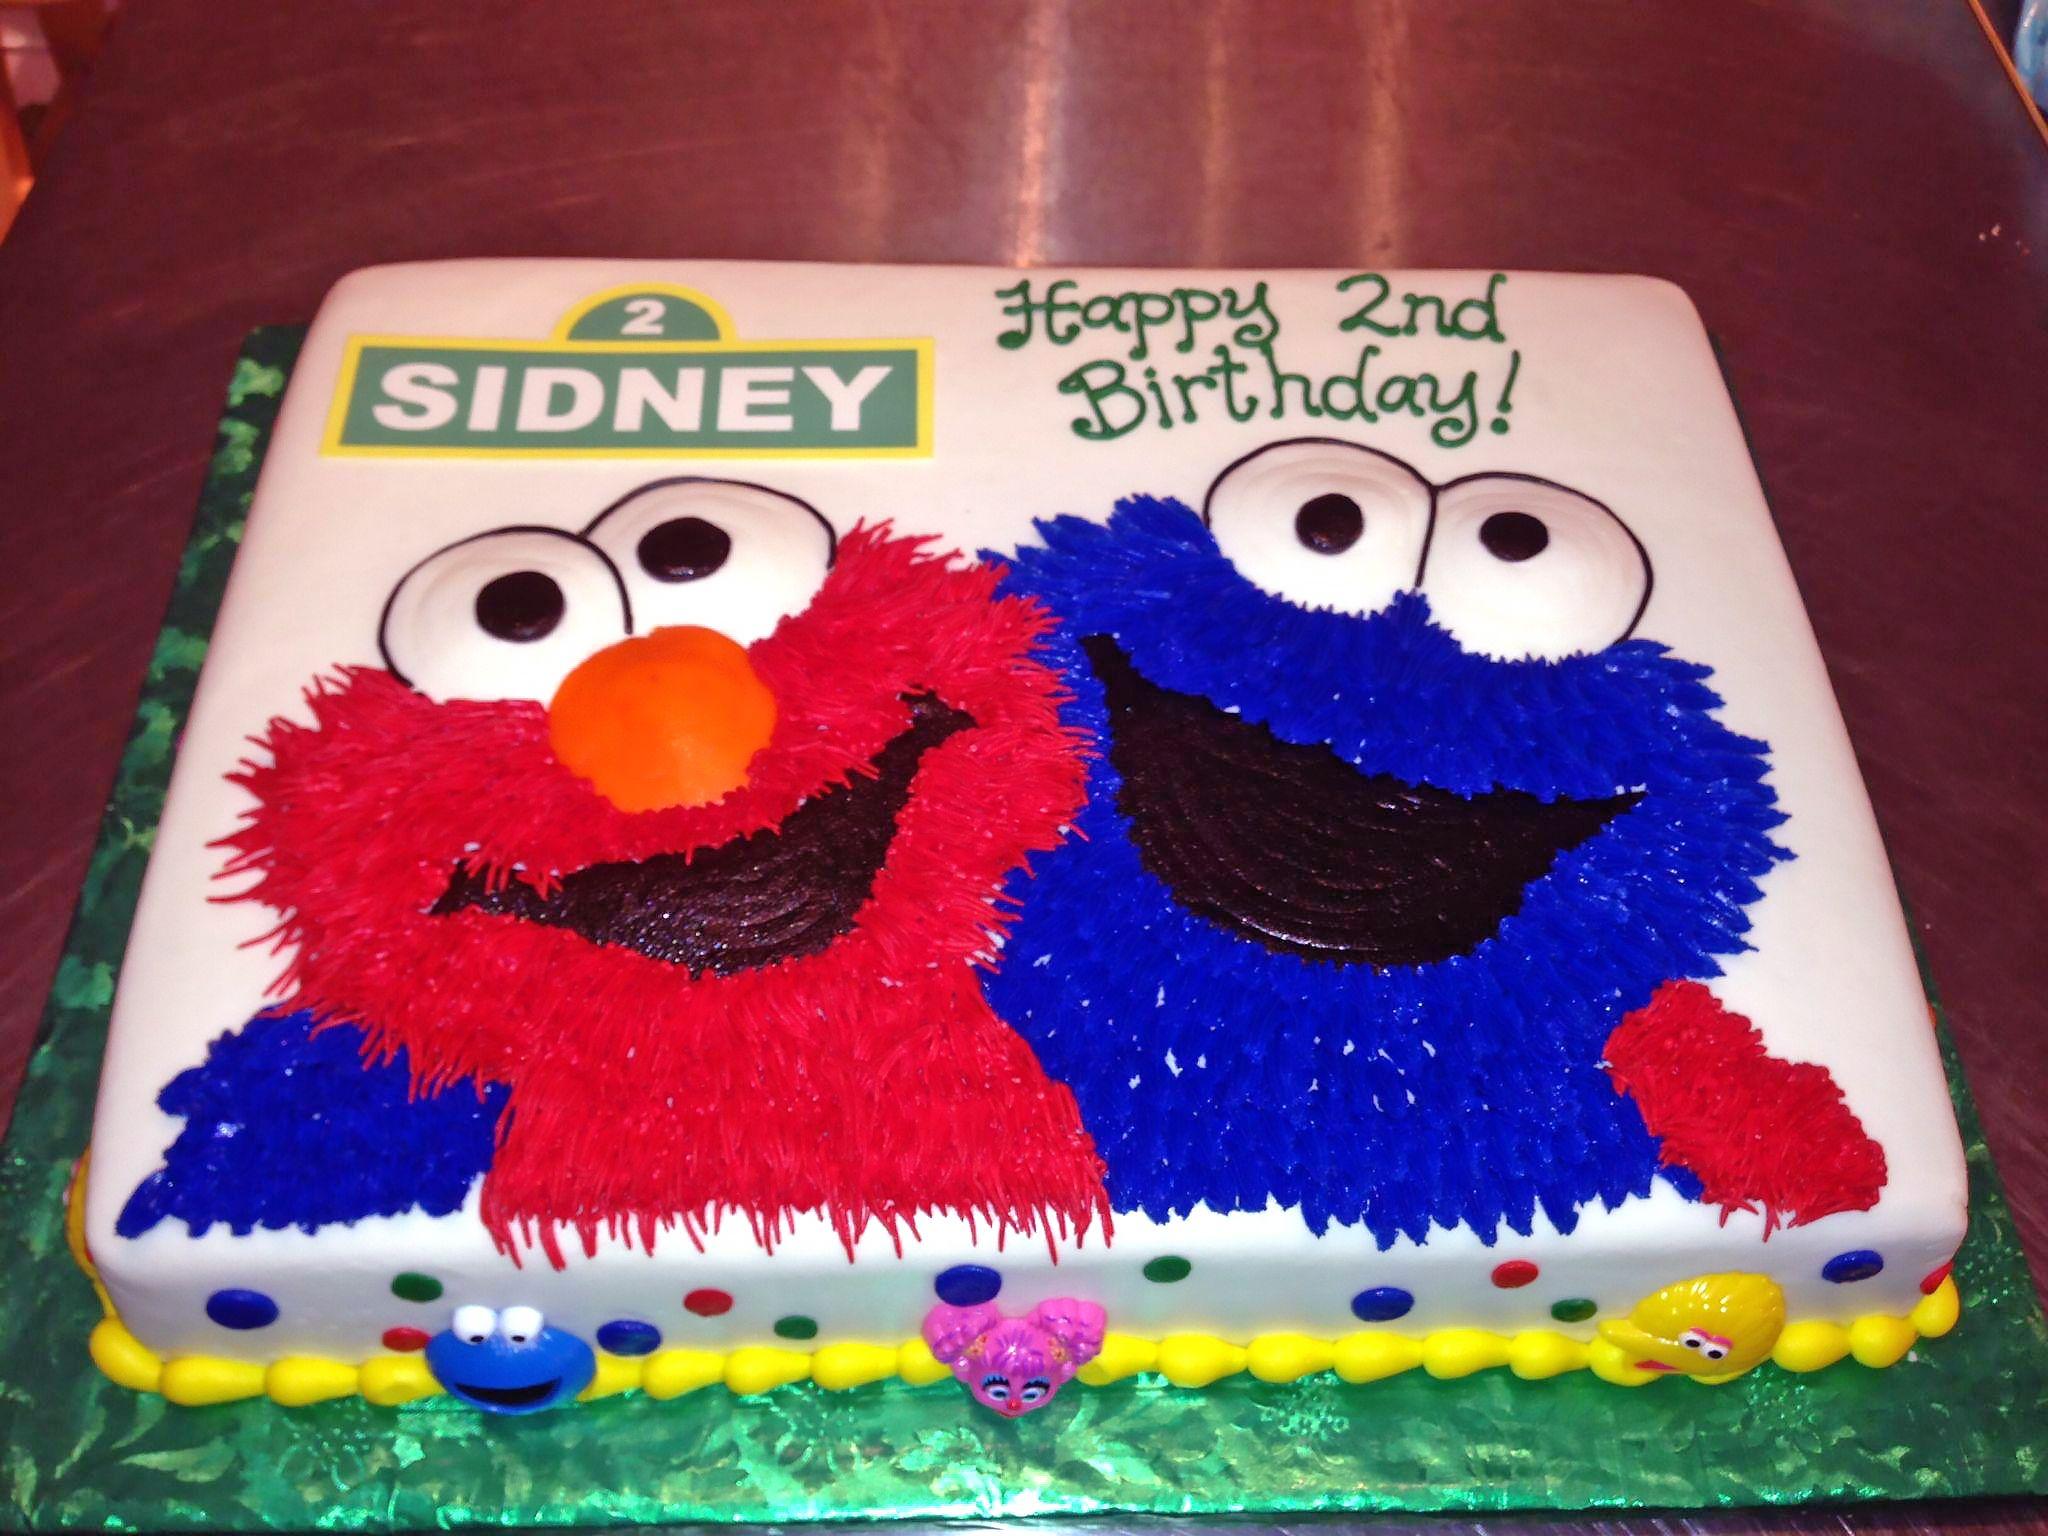 2nd Birthday Cake Cookie Monster Elmo Kids Sesame